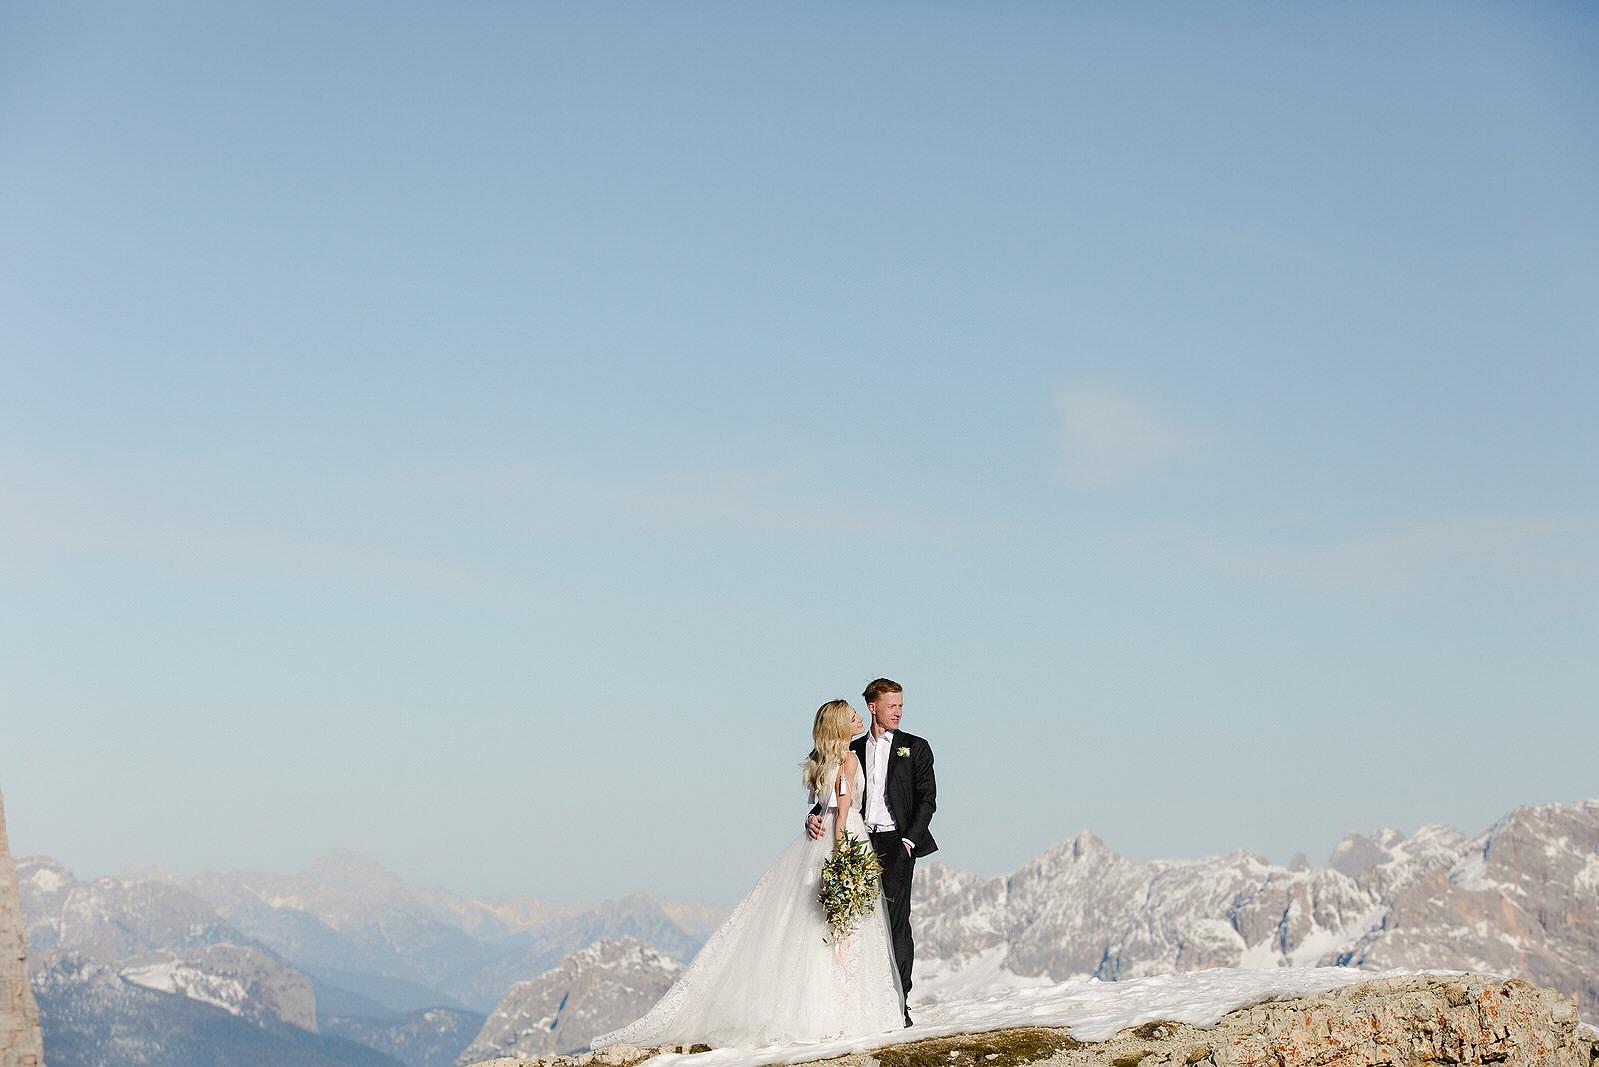 Adventurous+Dolomites+Elopement+Wedding+Fotomagoria14.jpg